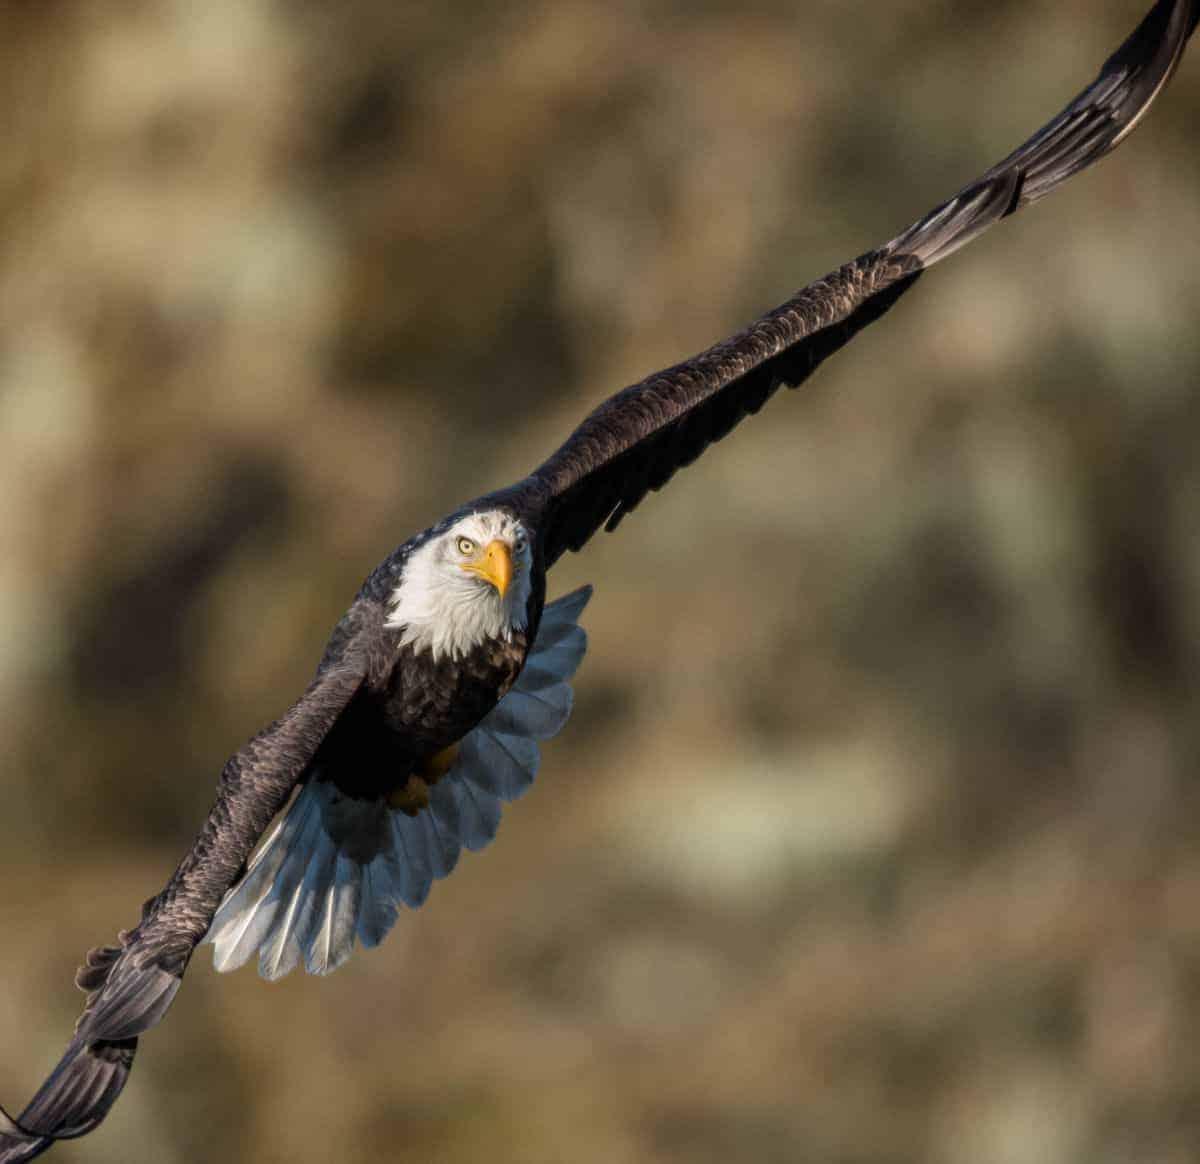 Bald eagle in flight above the Skagit River, Washington.